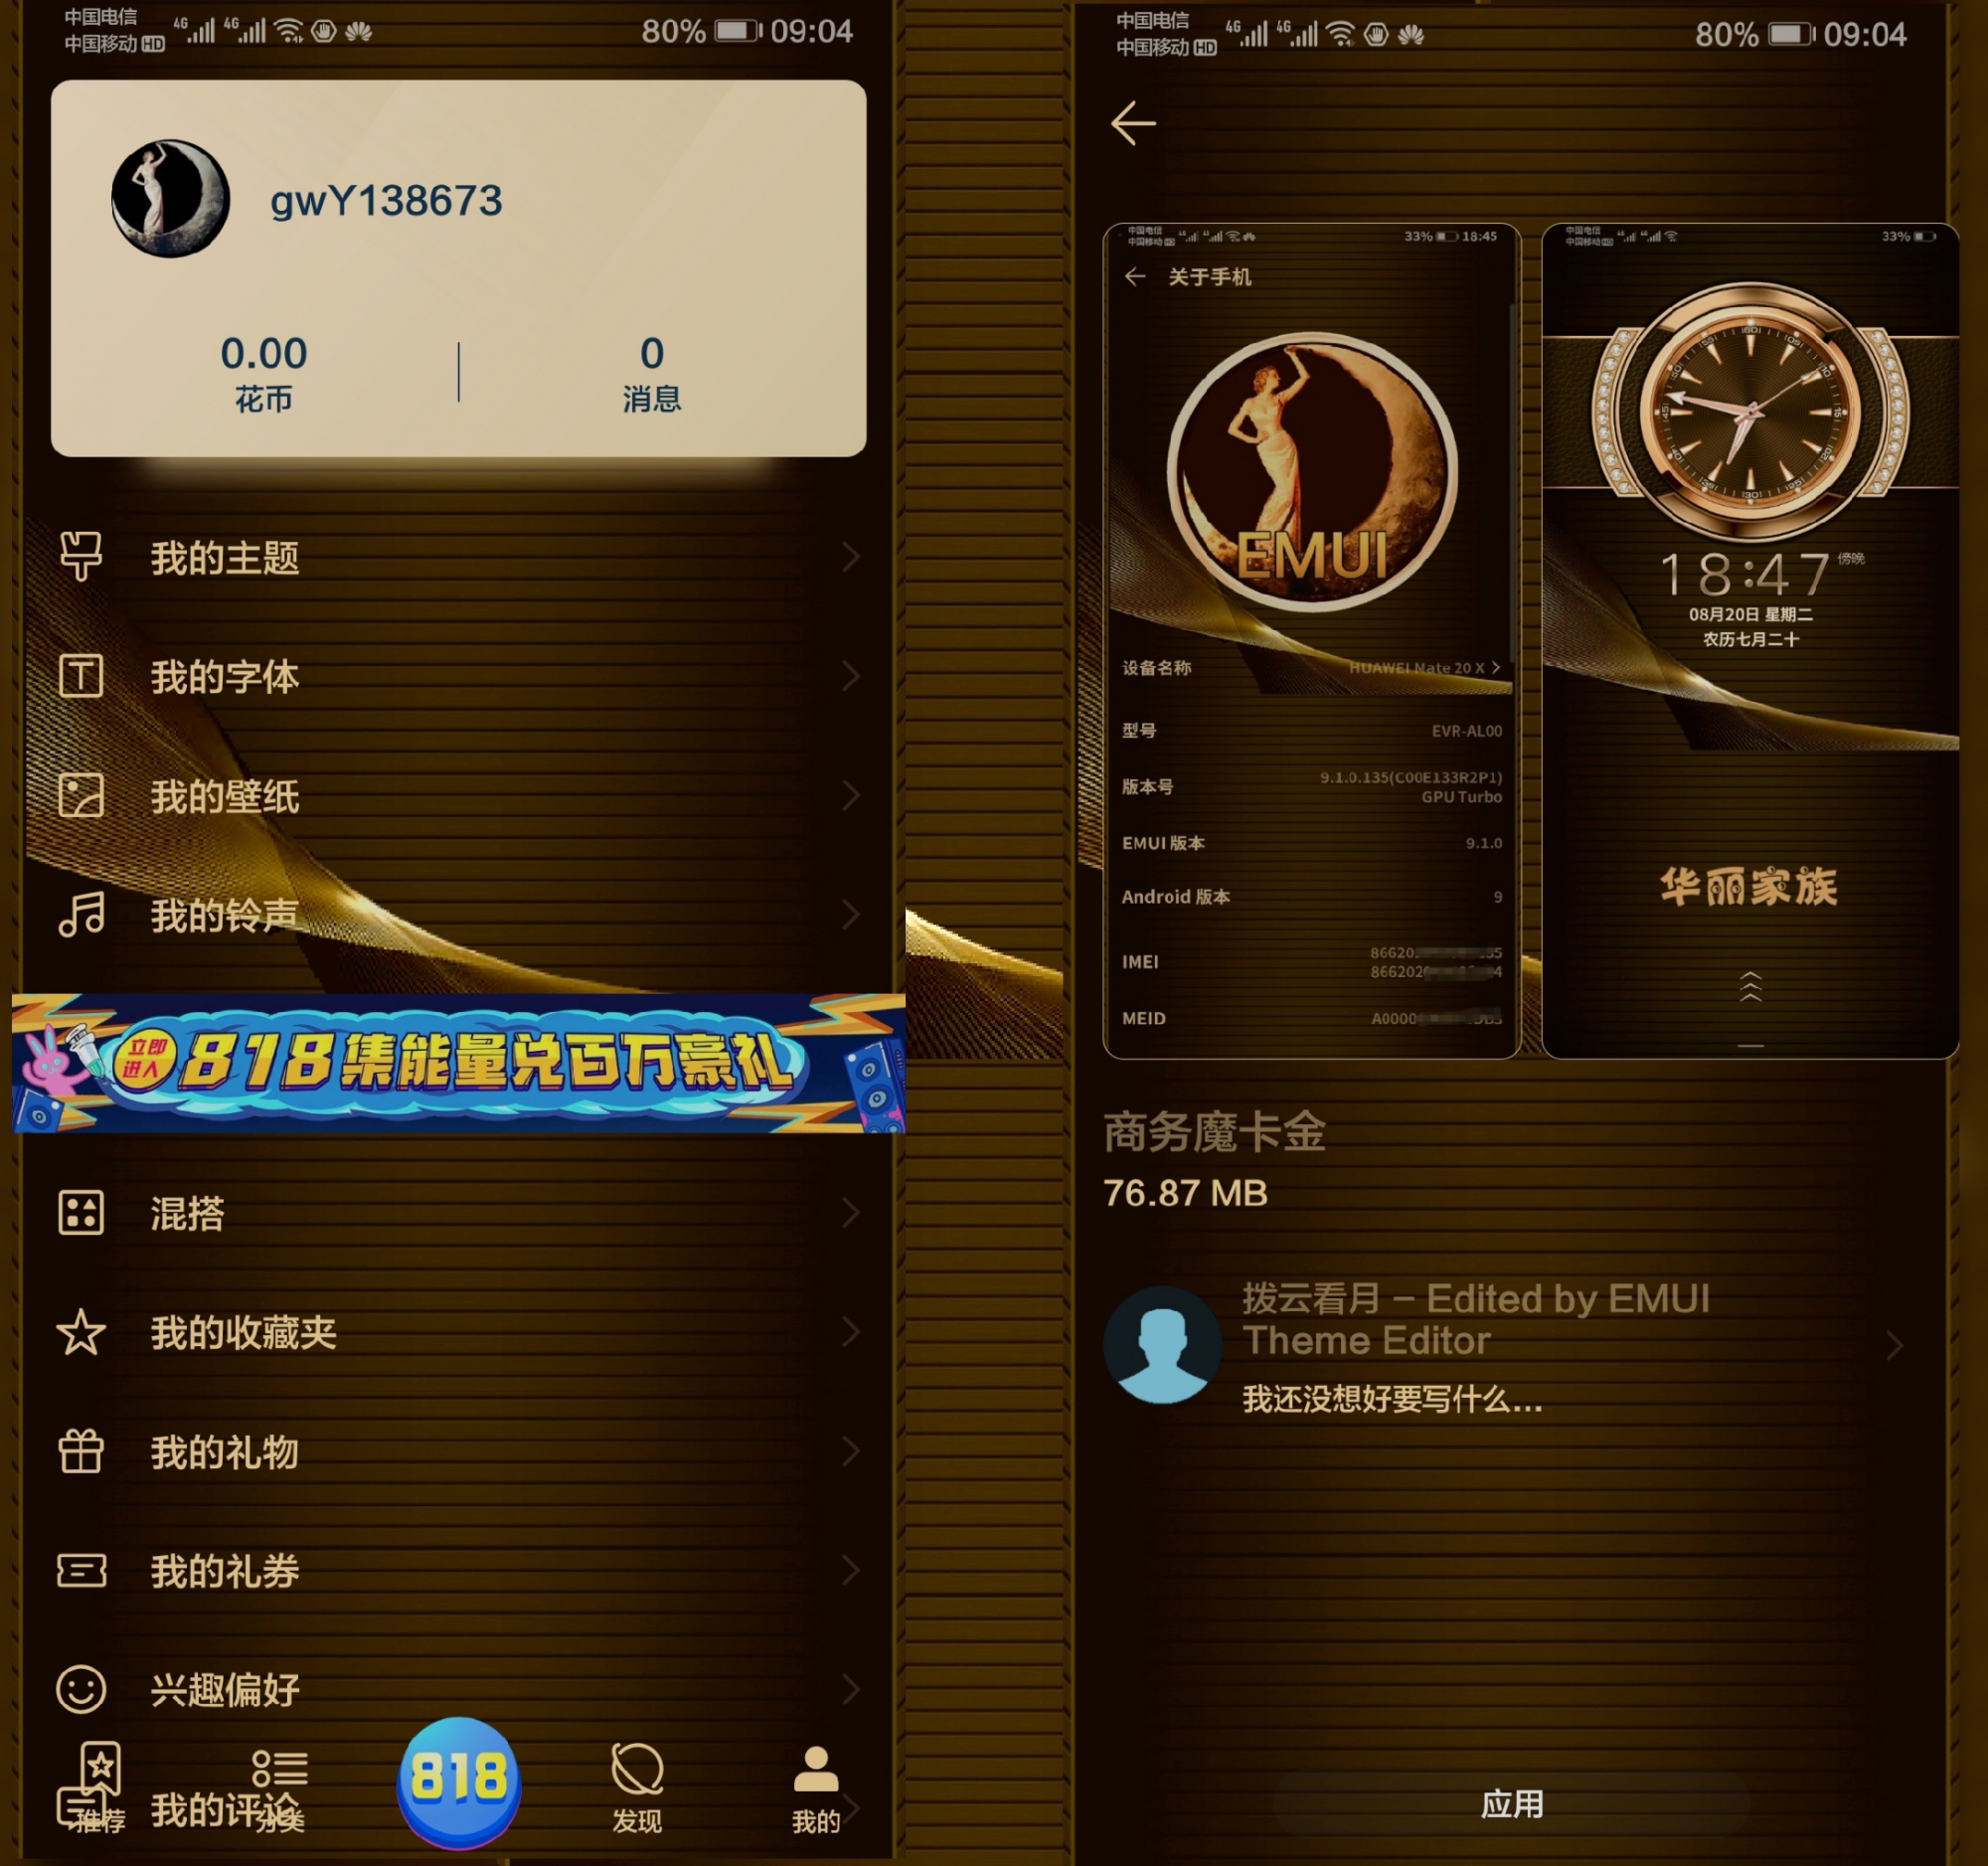 background_emui.9_1566364717566_1566377788746_1566436050512.jpg